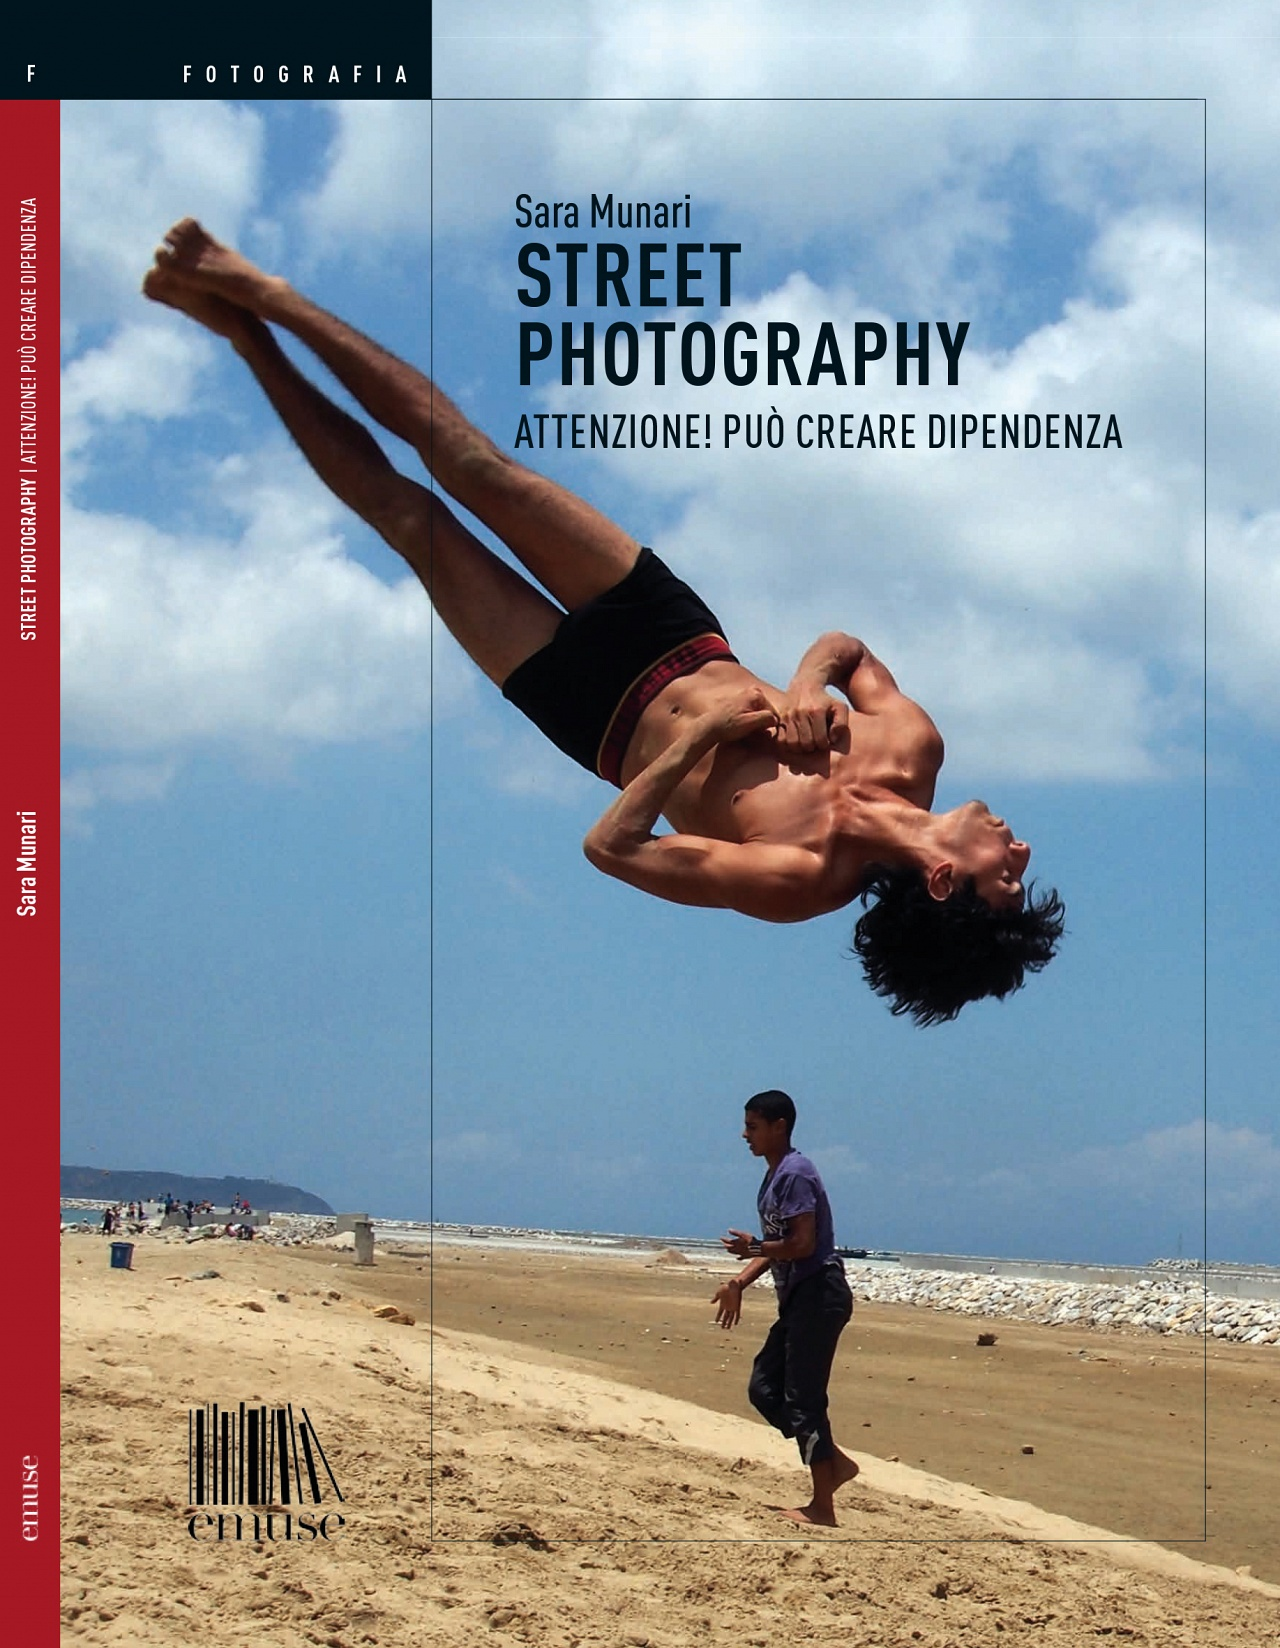 copertina_street_photo.jpg